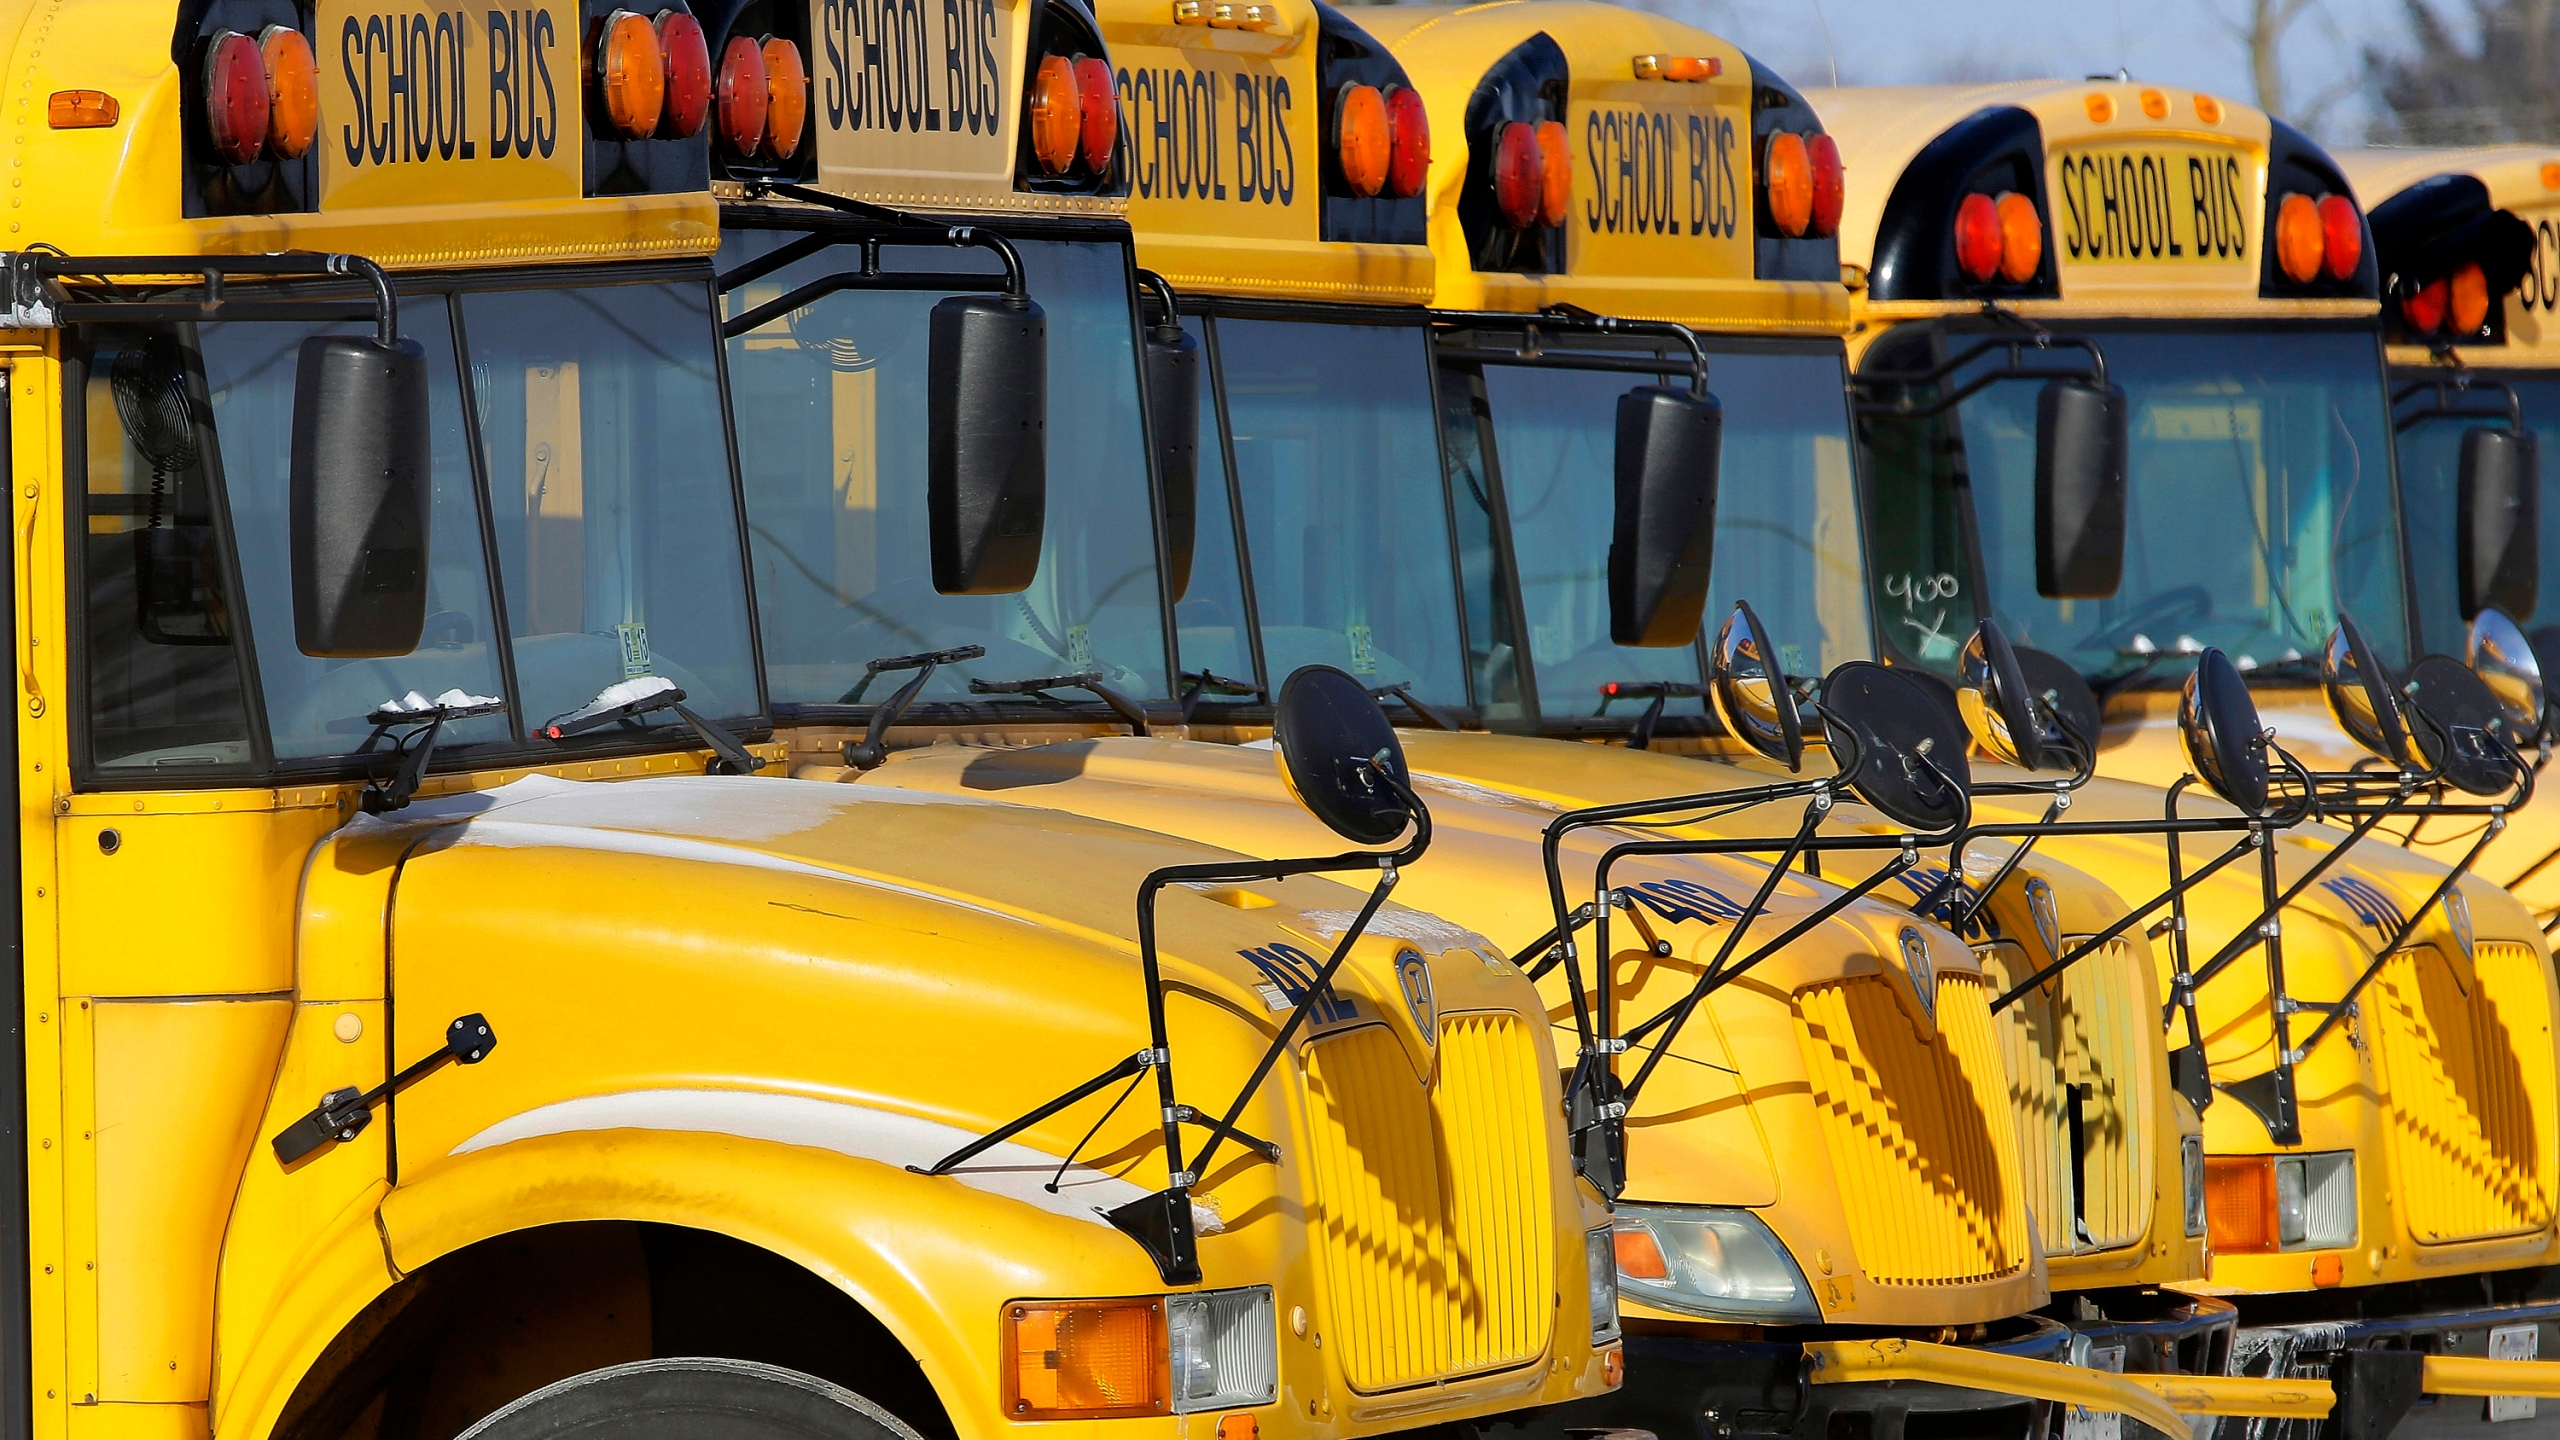 school bus generic_380507